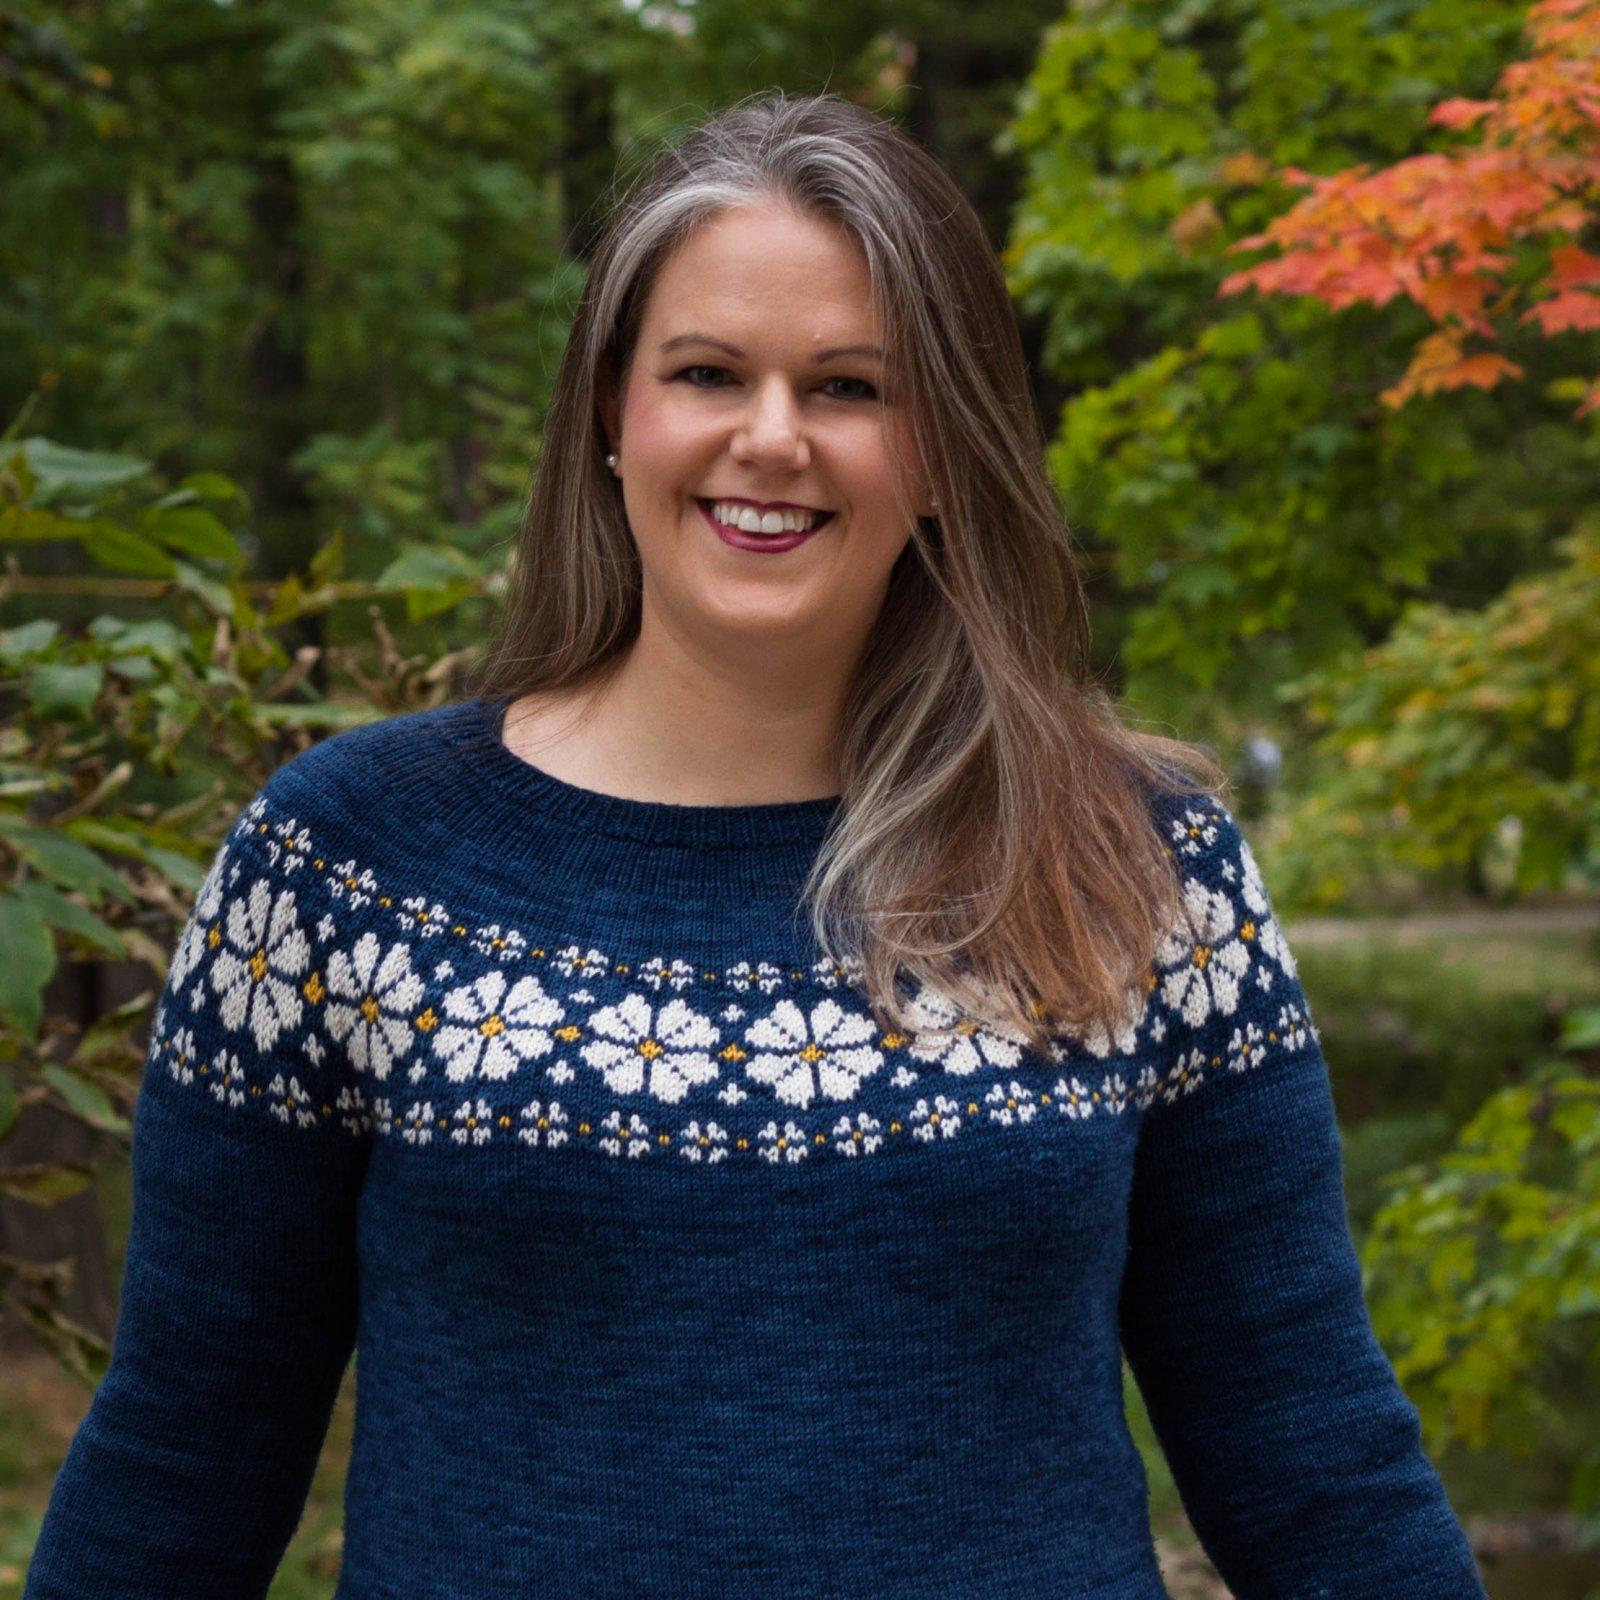 Fiberside Chats: Lisa K. Ross of Paper Daisy Creations October 30th